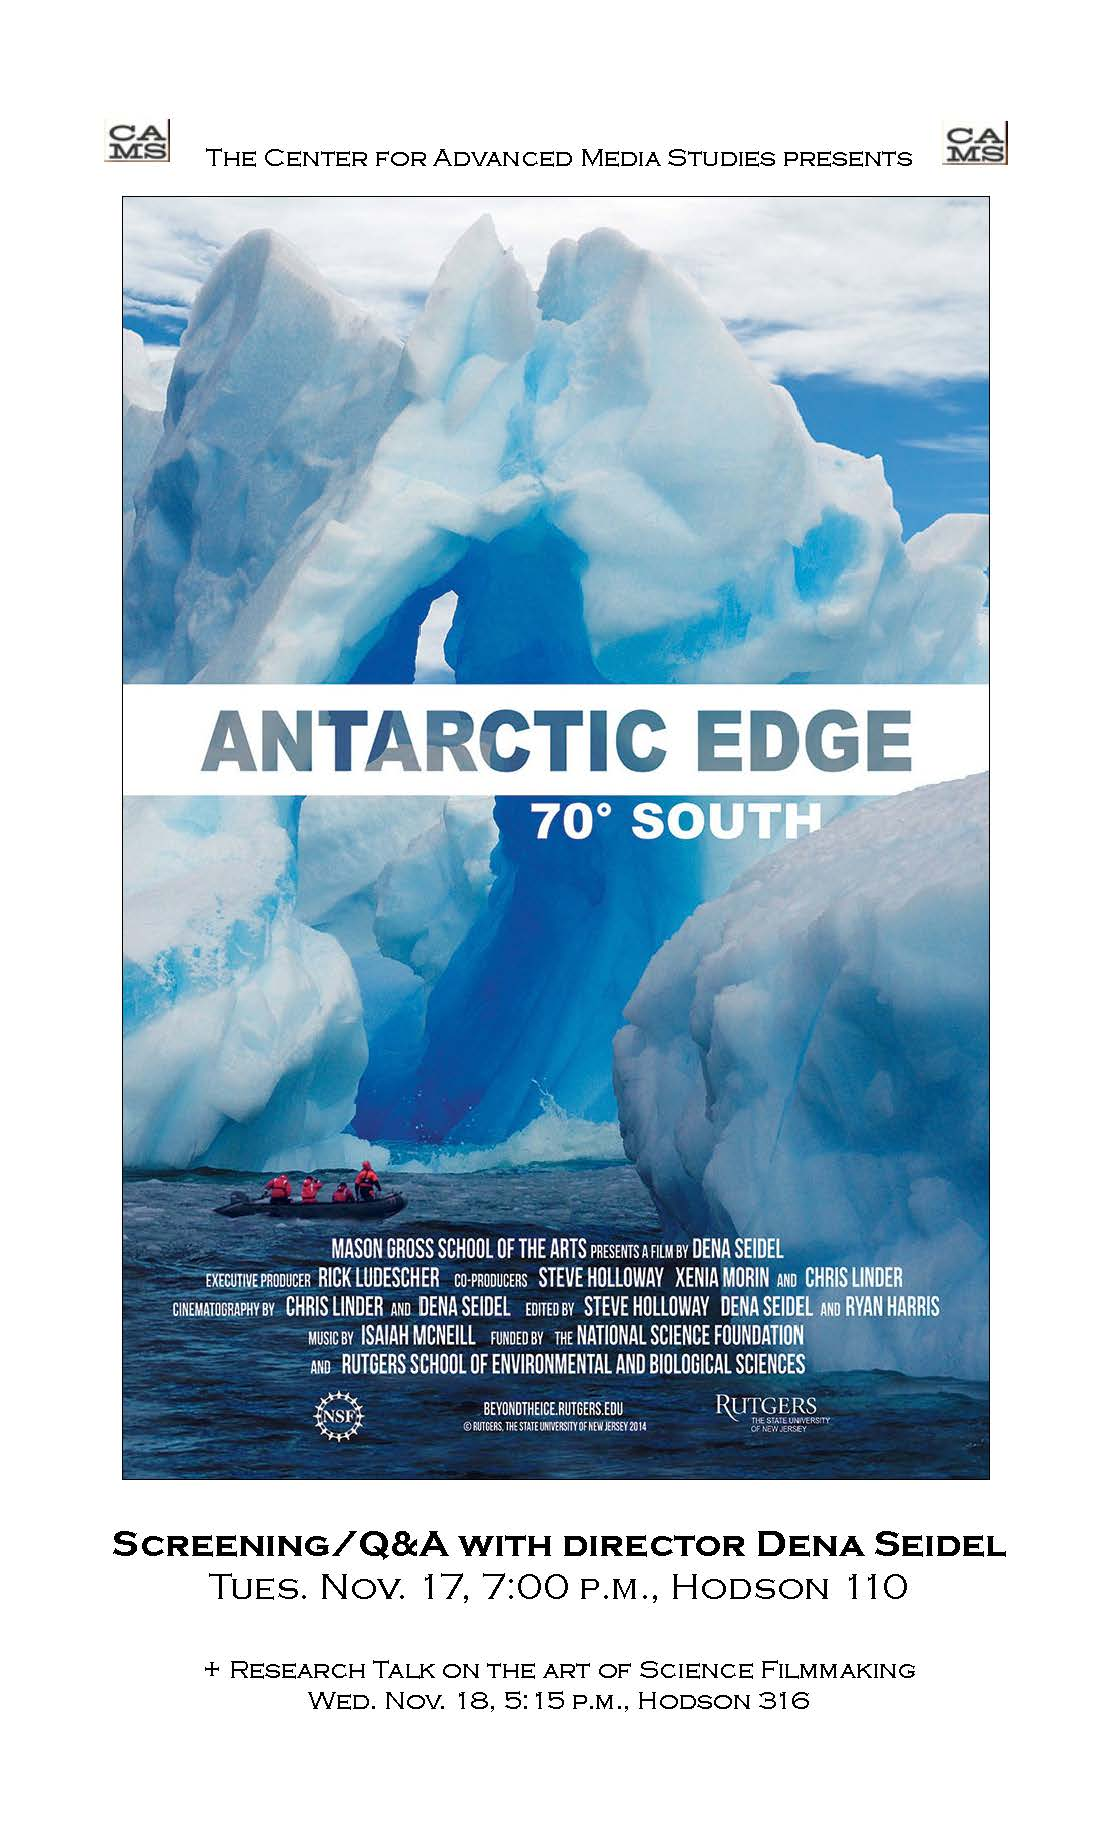 AntarcticEdge ScreeningNov17@7pm_CAMS